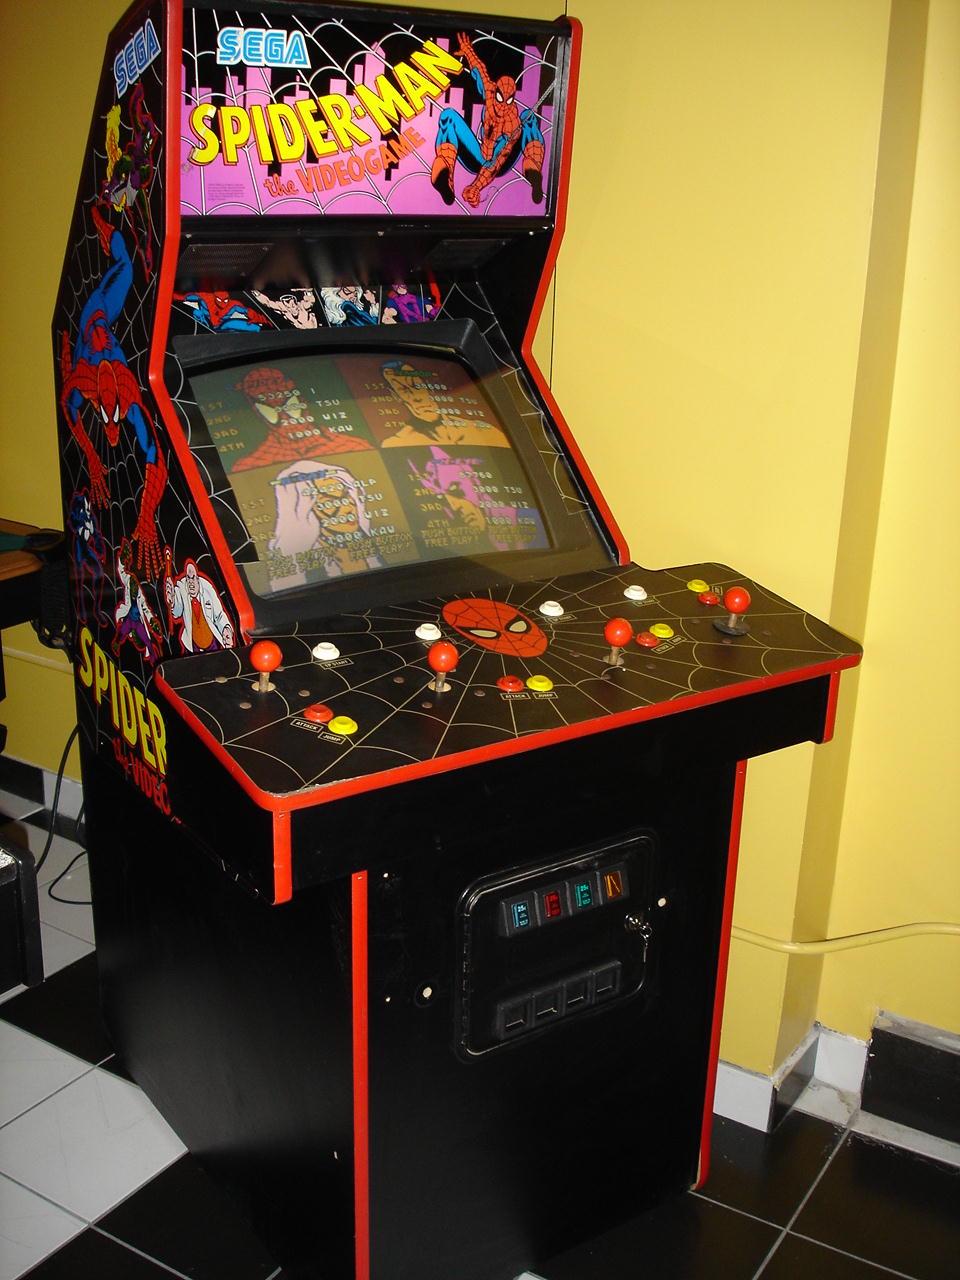 Spider-Man - The Video Game arcade cabinet